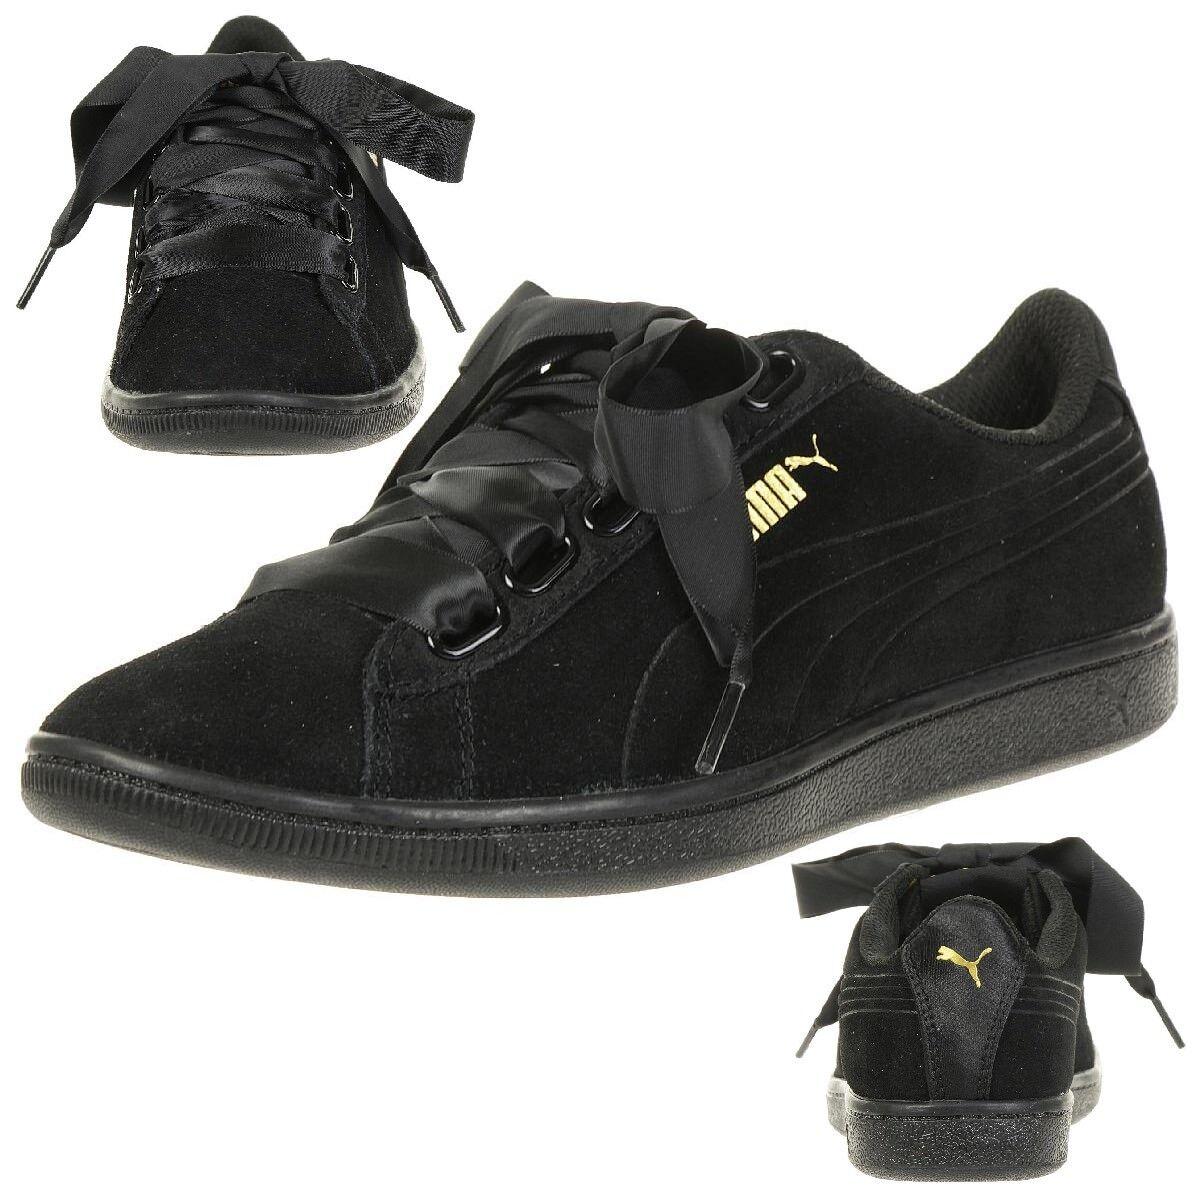 Puma Vikky Ribbon S Sneaker Damen Schuhe 366416 01 schwarz